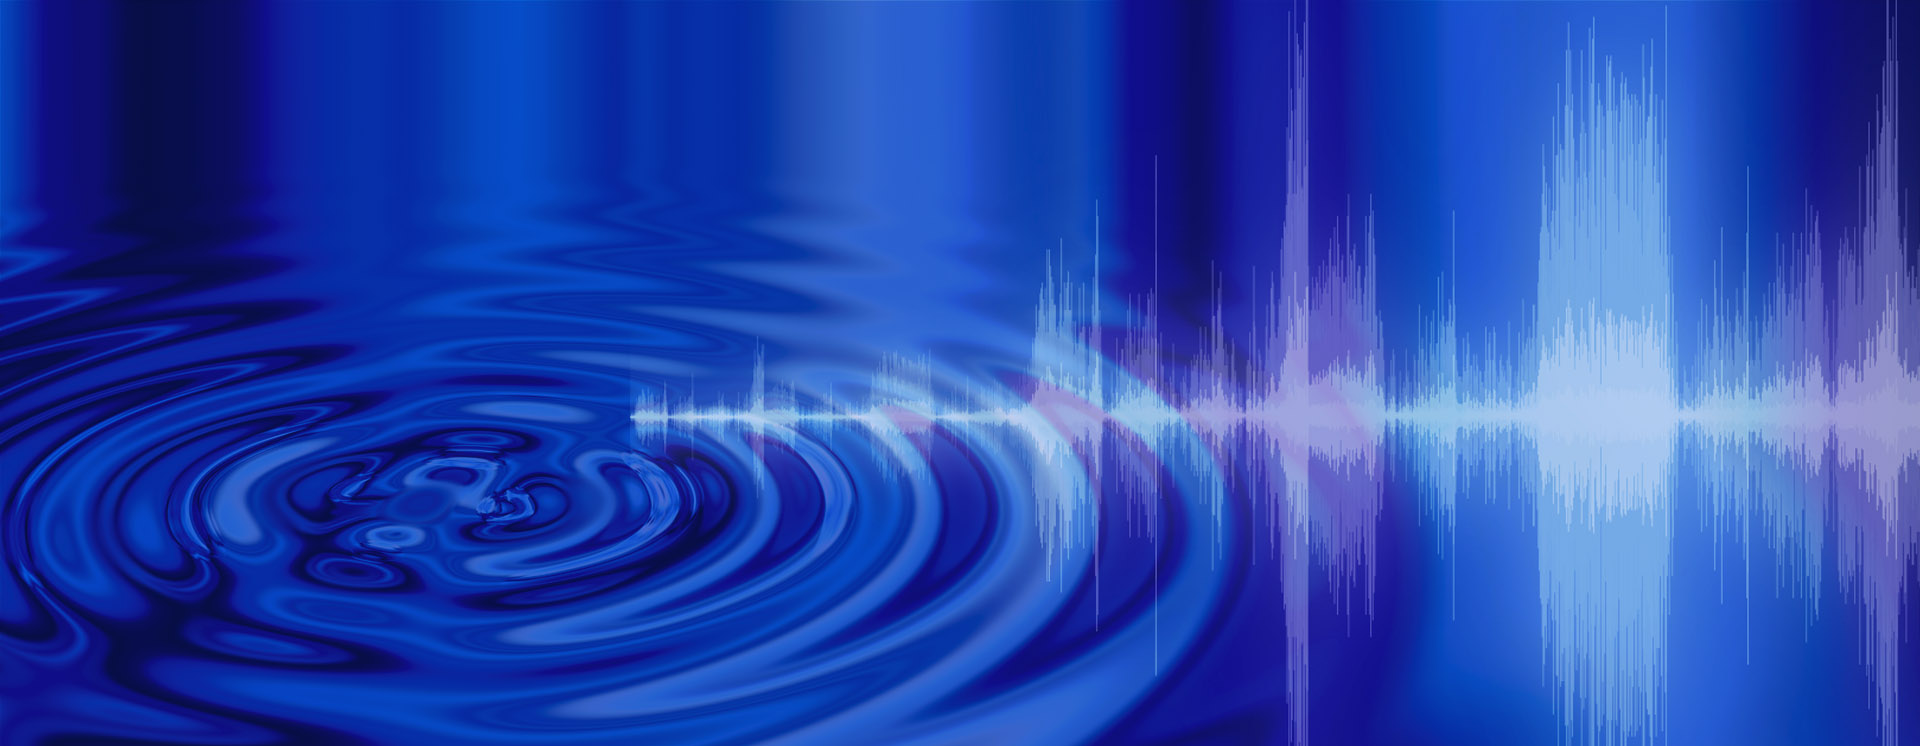 Geophone DTCC Dynamic Technology Canada United States Geophones Geophysical Surveying Energy Business smartsolo seismic sensor smart